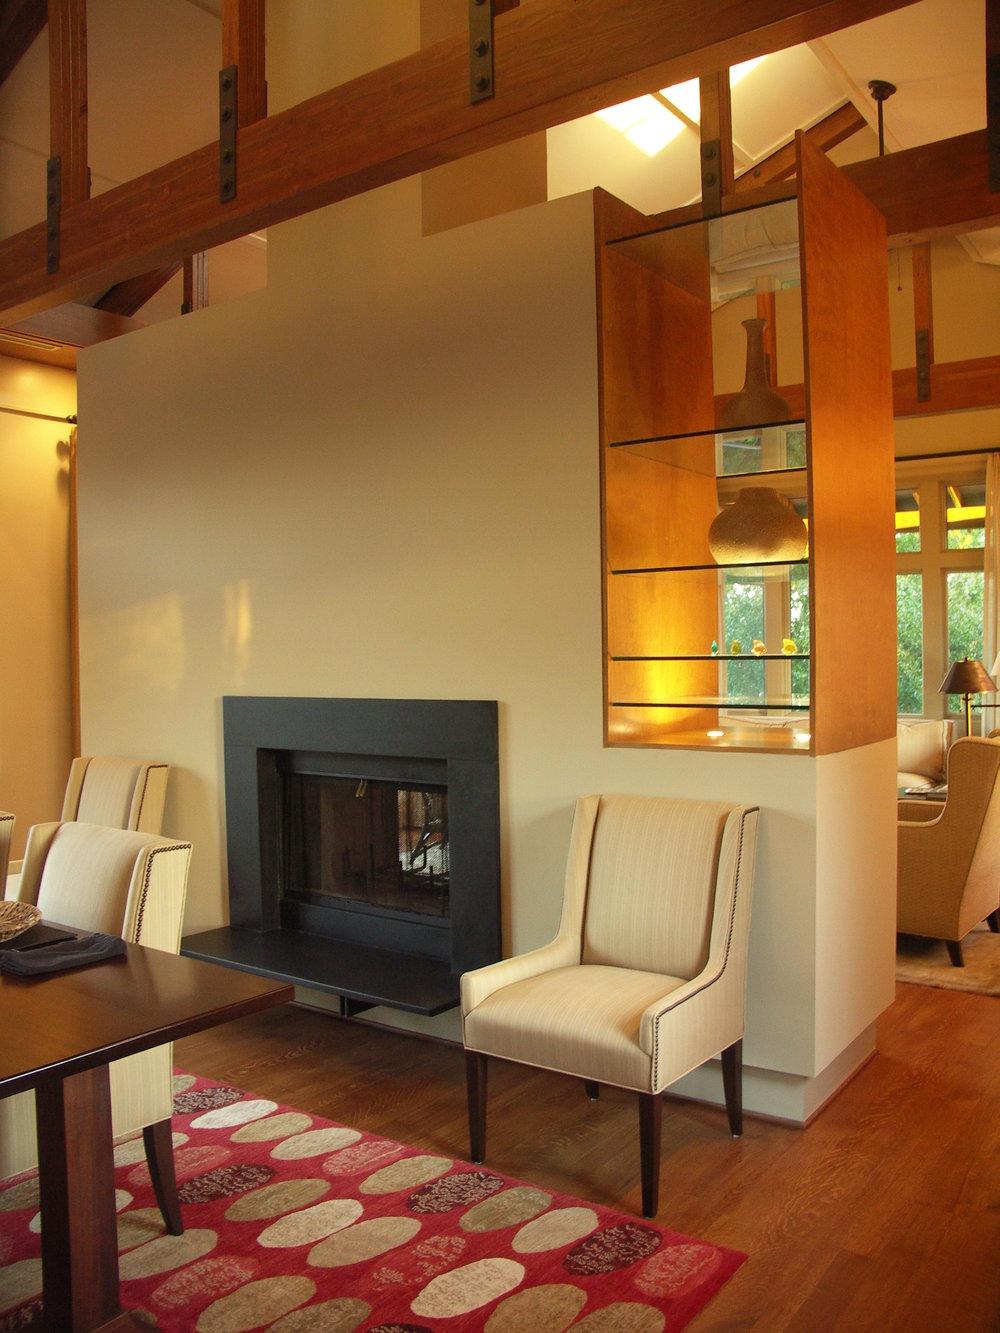 Kliros _Dewees_DiningRoom_Fireplace.jpg